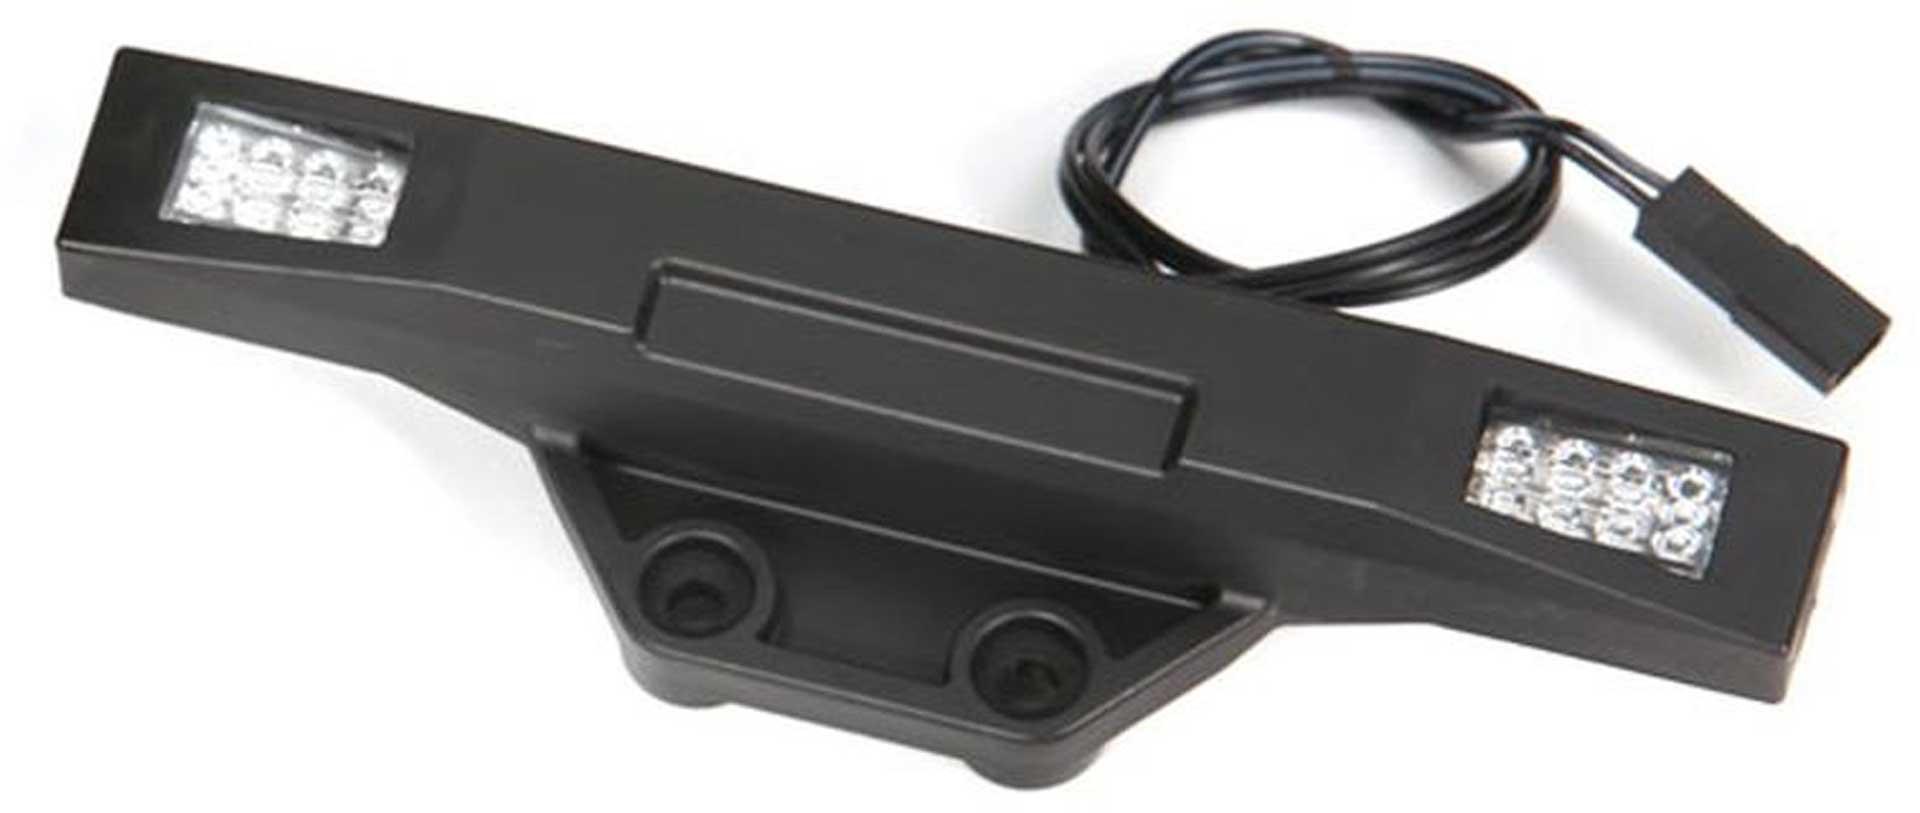 TRAXXAS HOSS Heck-Bumper mit LED-Beleuchtung (Ersatz für #9036)